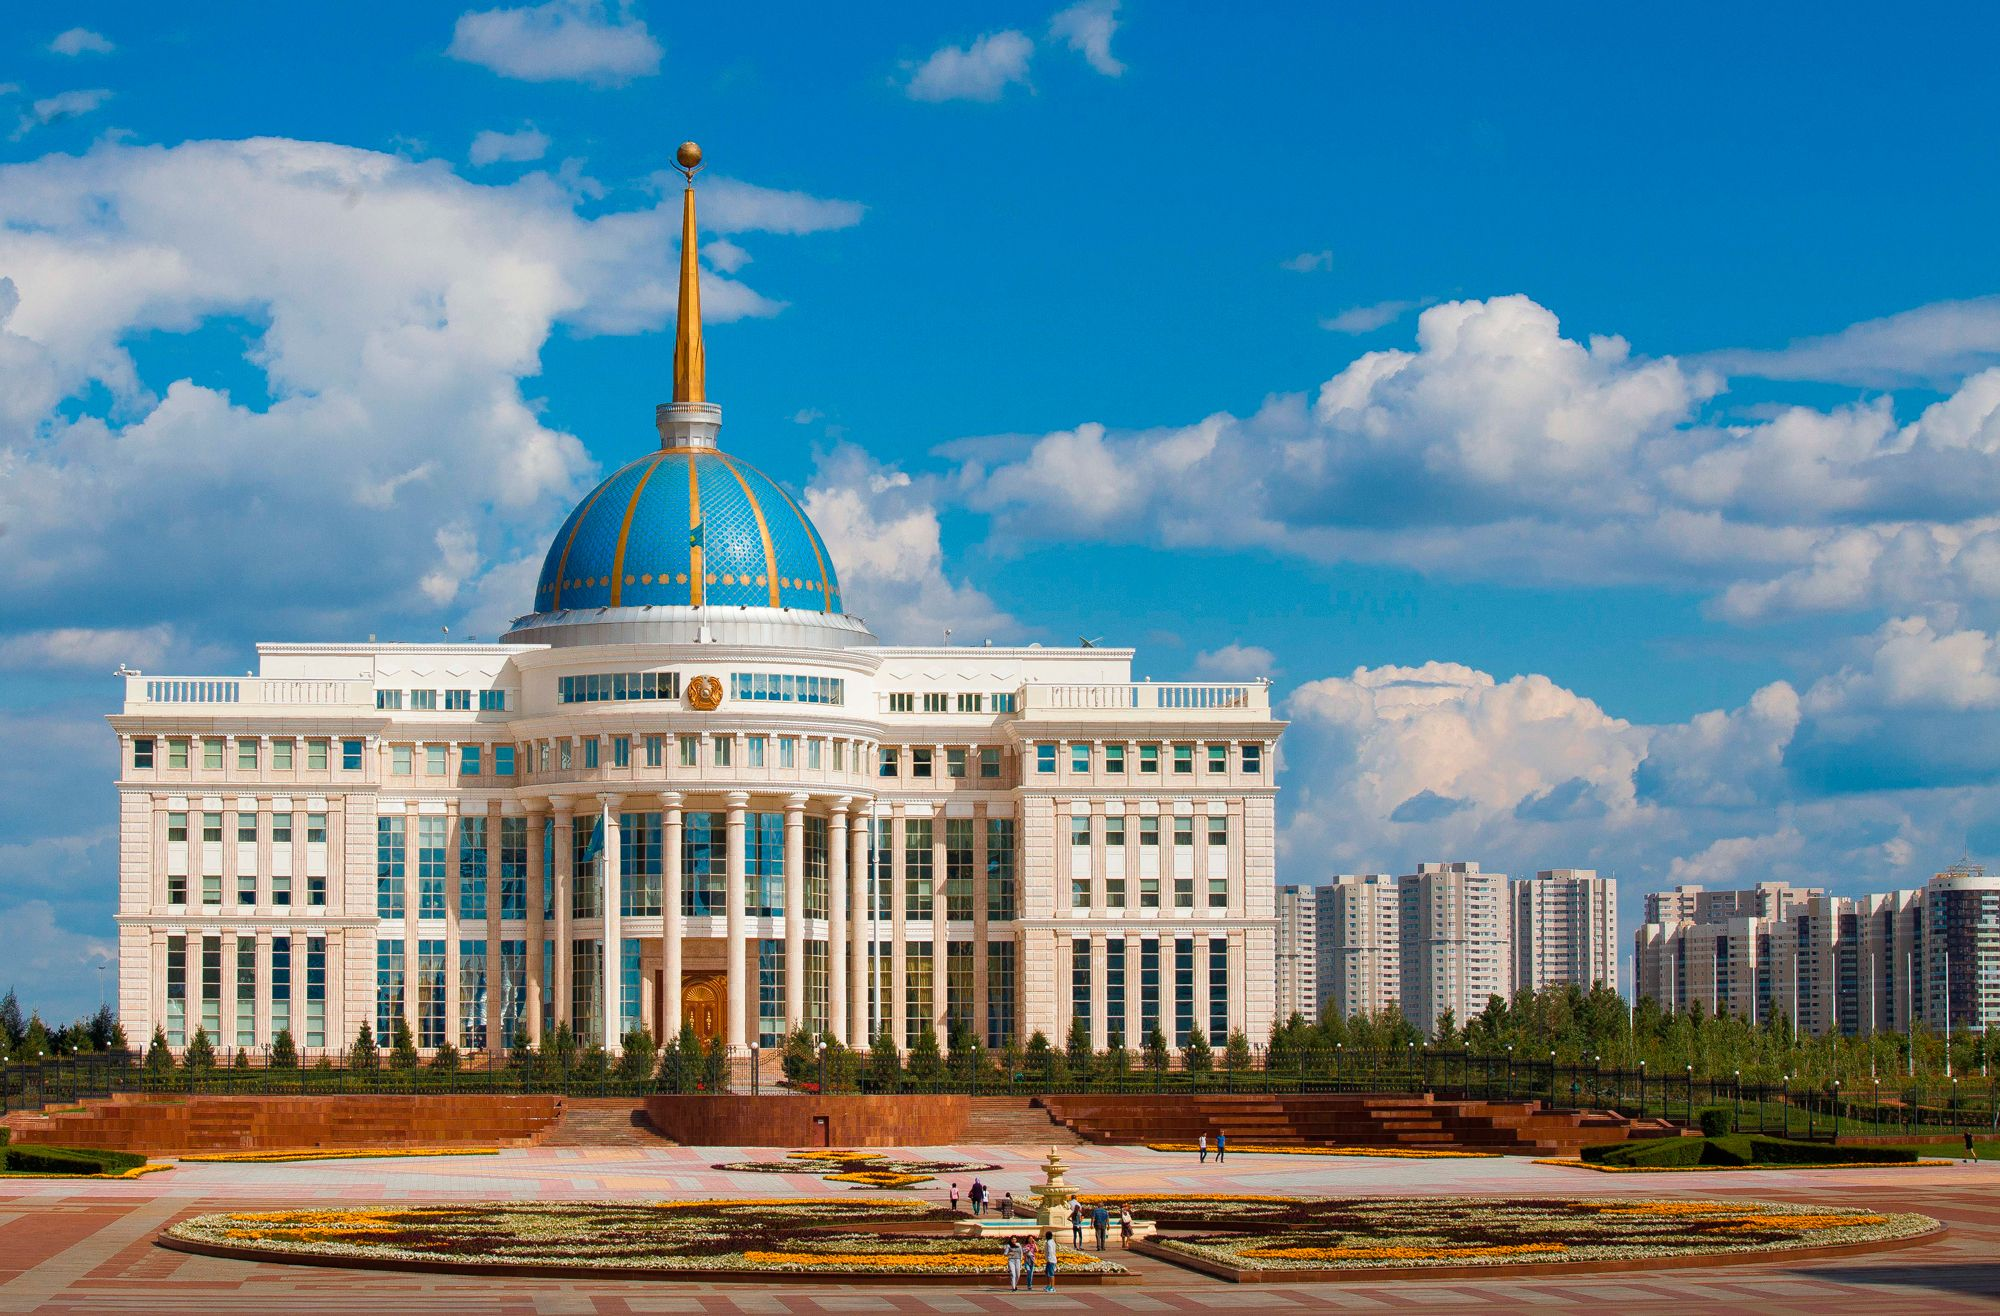 ГлаваРК поздравил Армена Саркисяна сизбранием президентом Армении- Kapital.kz